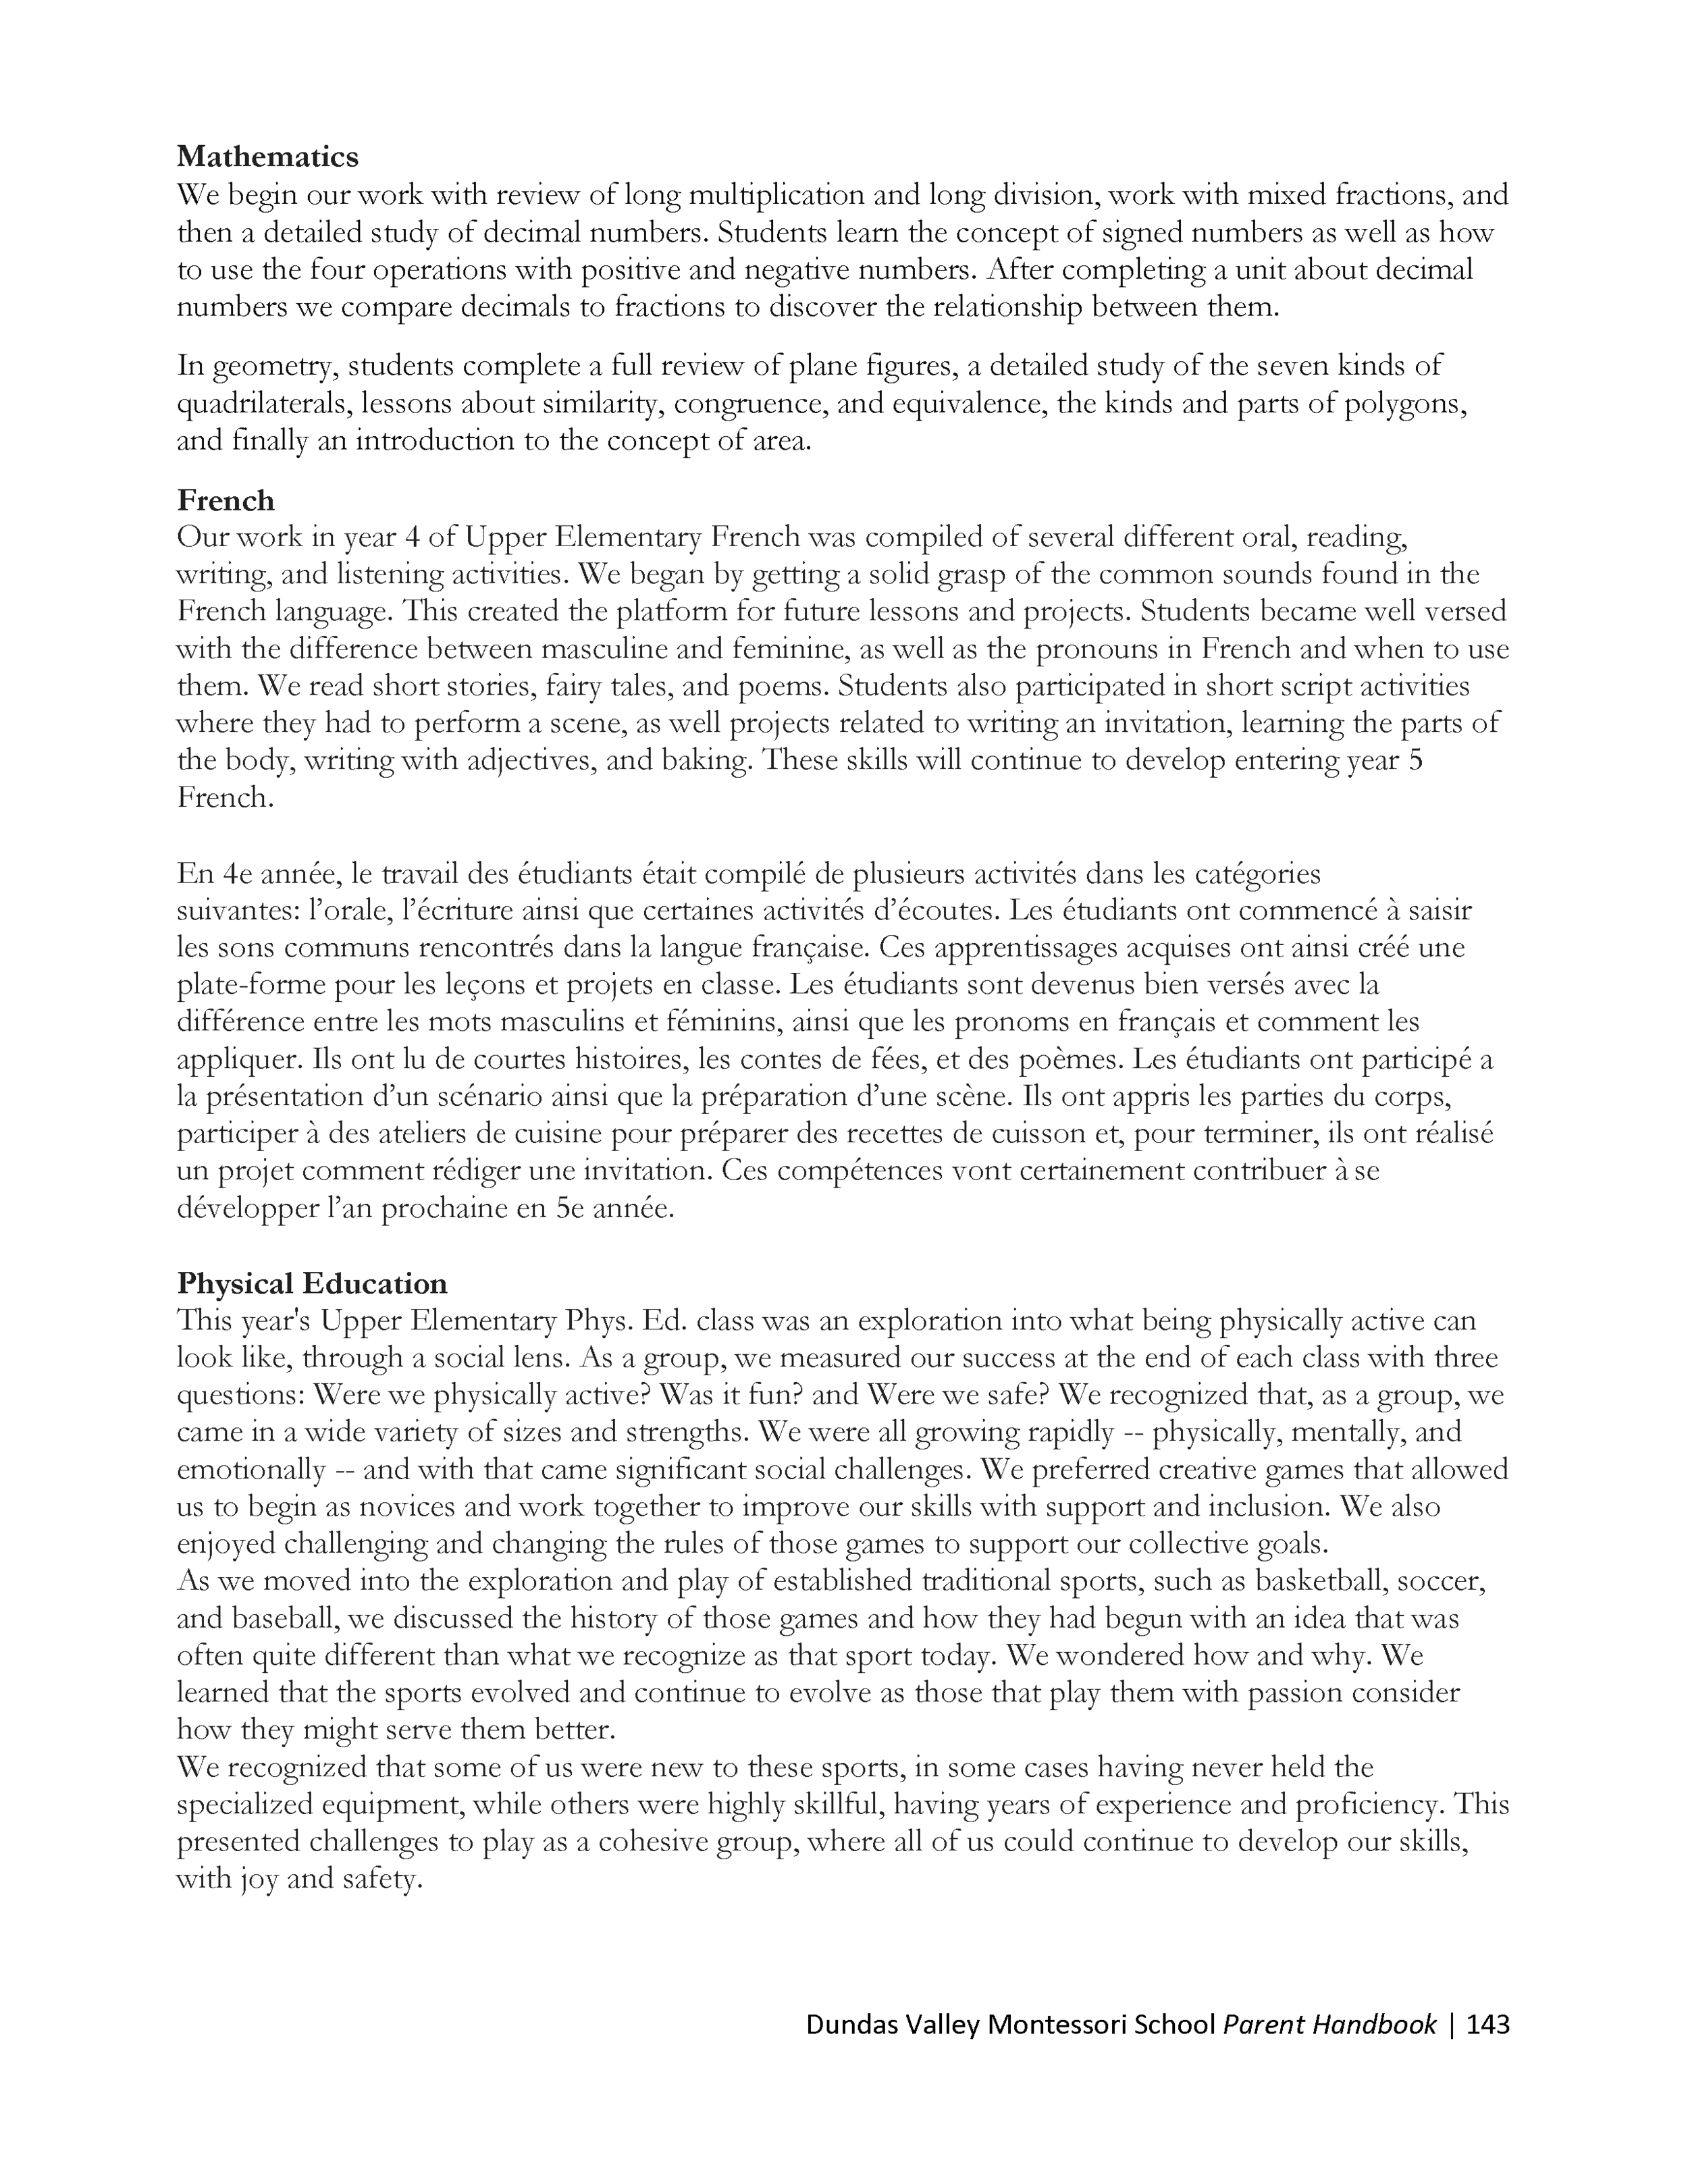 DVMS-Parent-Handbook-19-20_Page_145.png